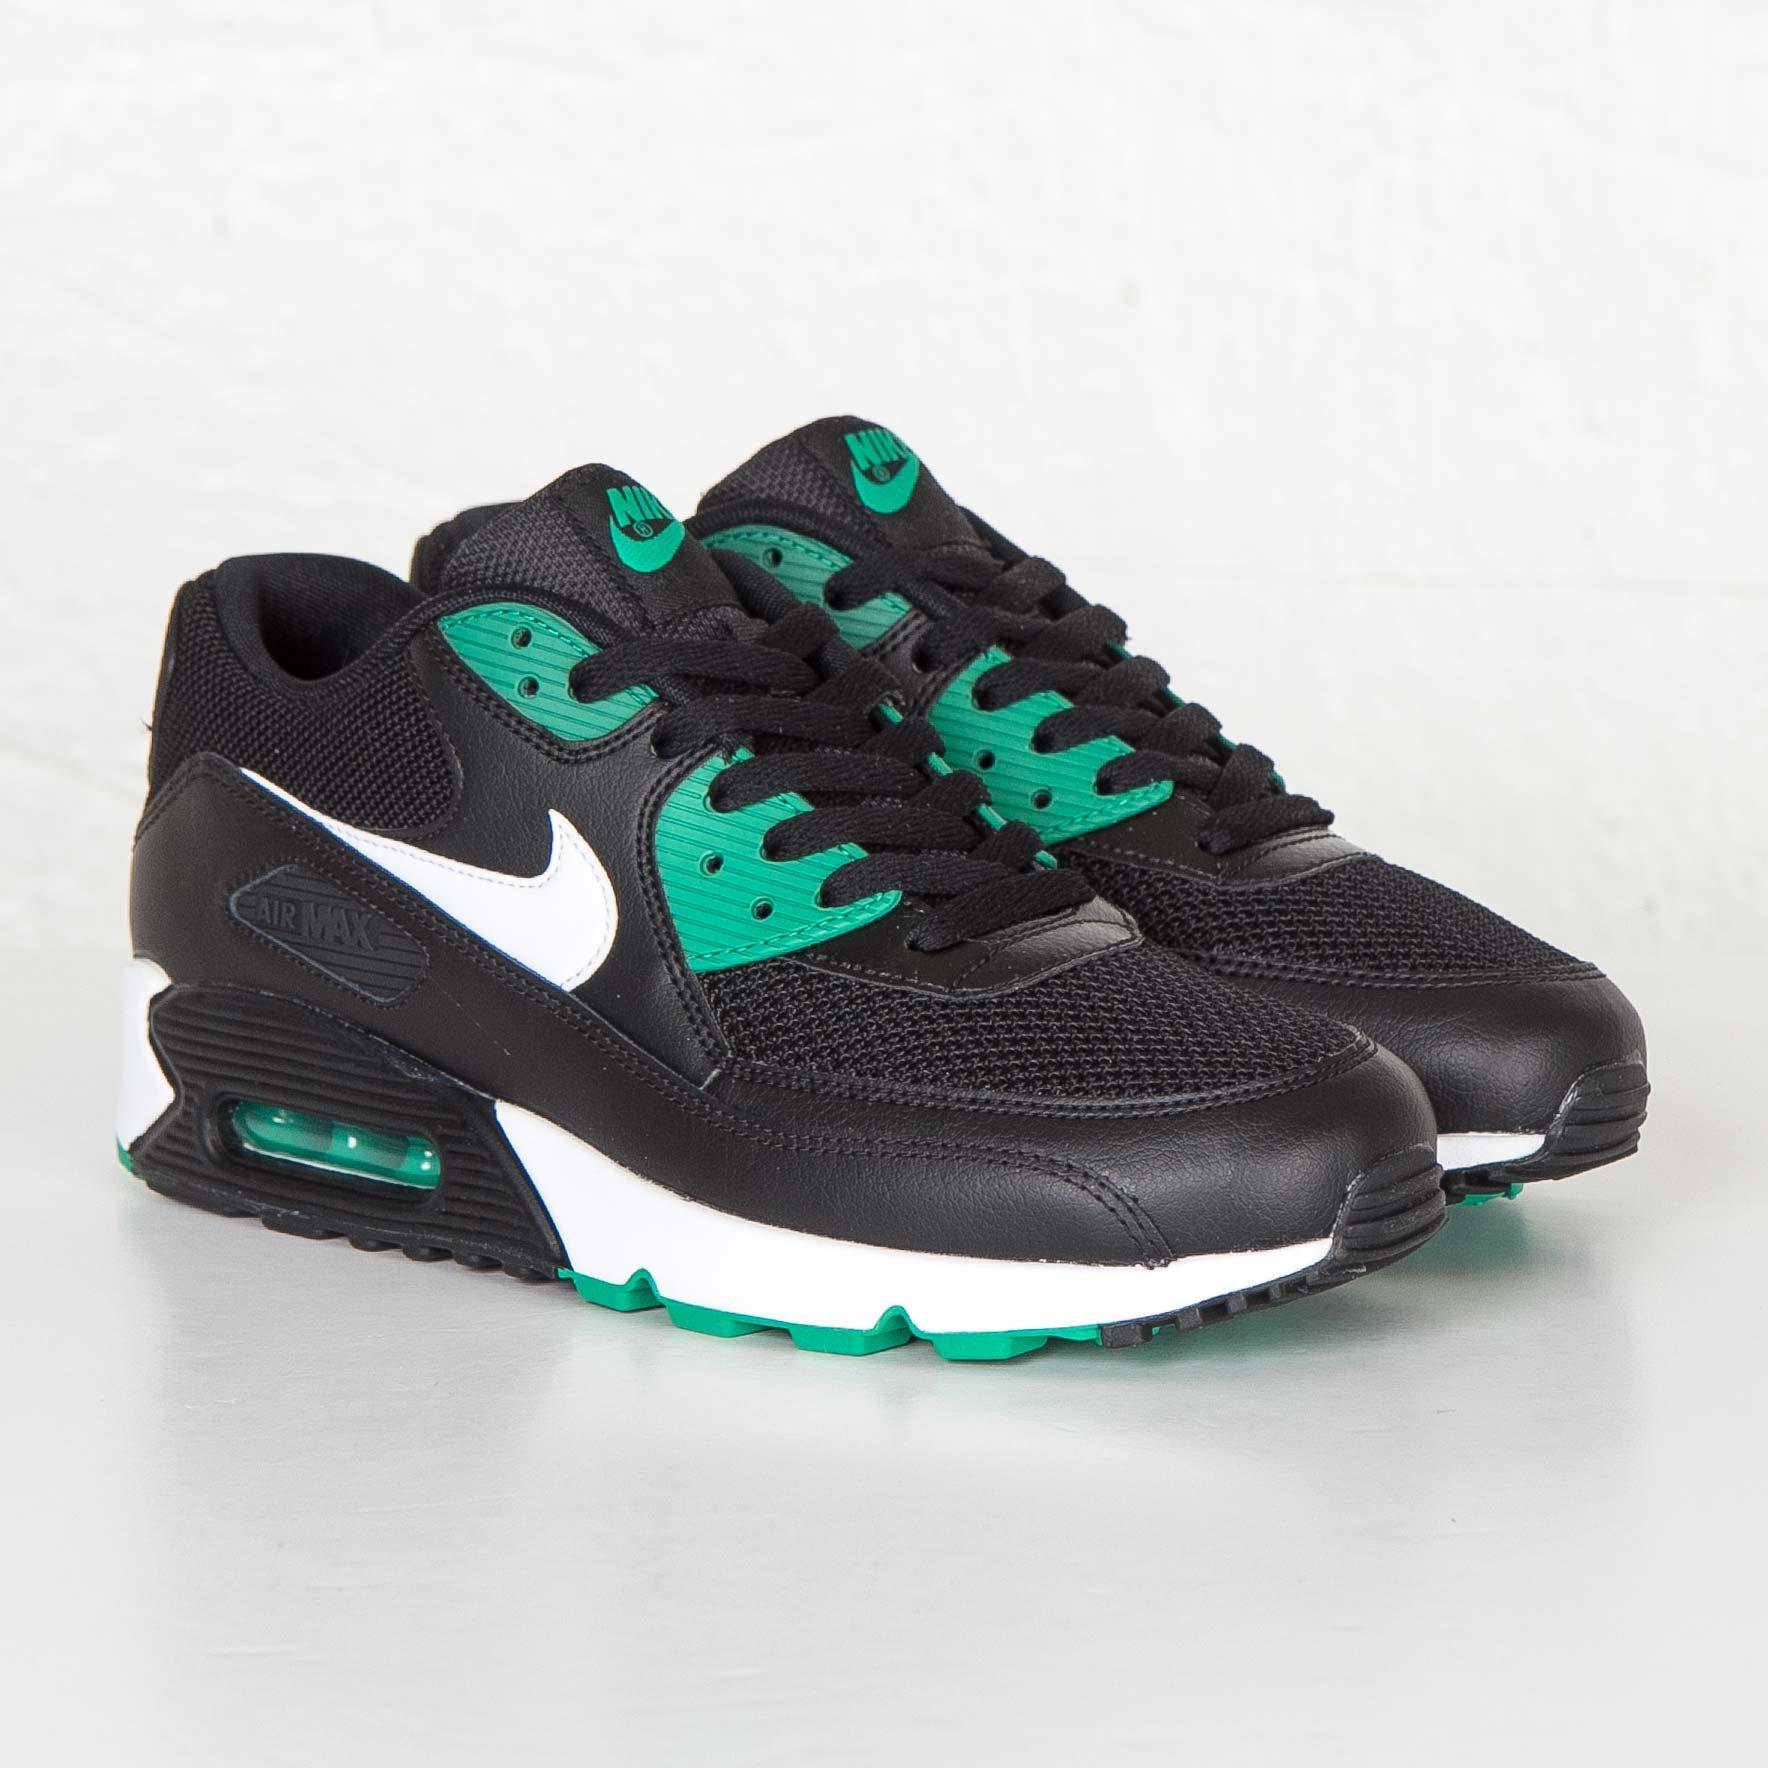 reputable site 775af c8f05 Nike Air Max 90 Essential